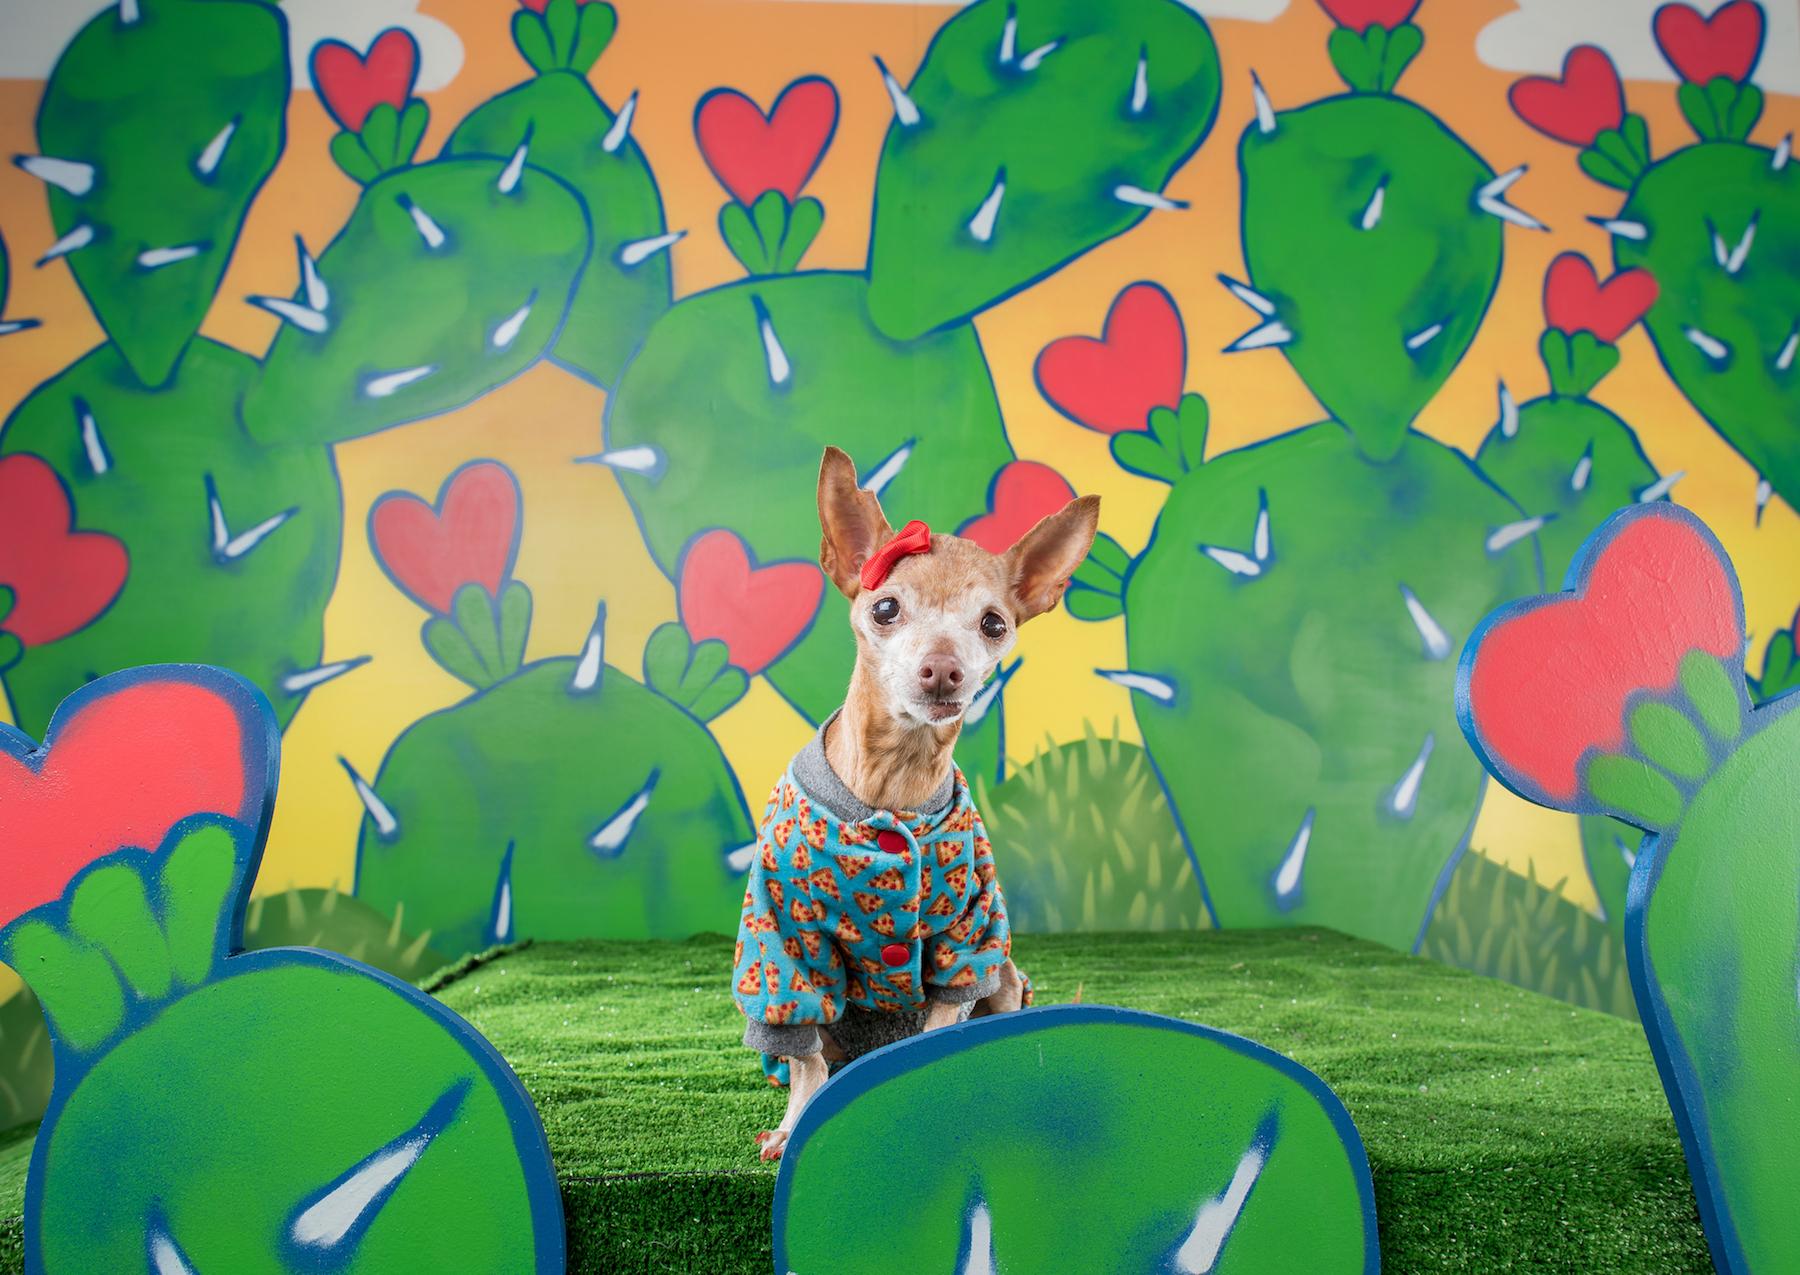 Sweet barks promo 42 2